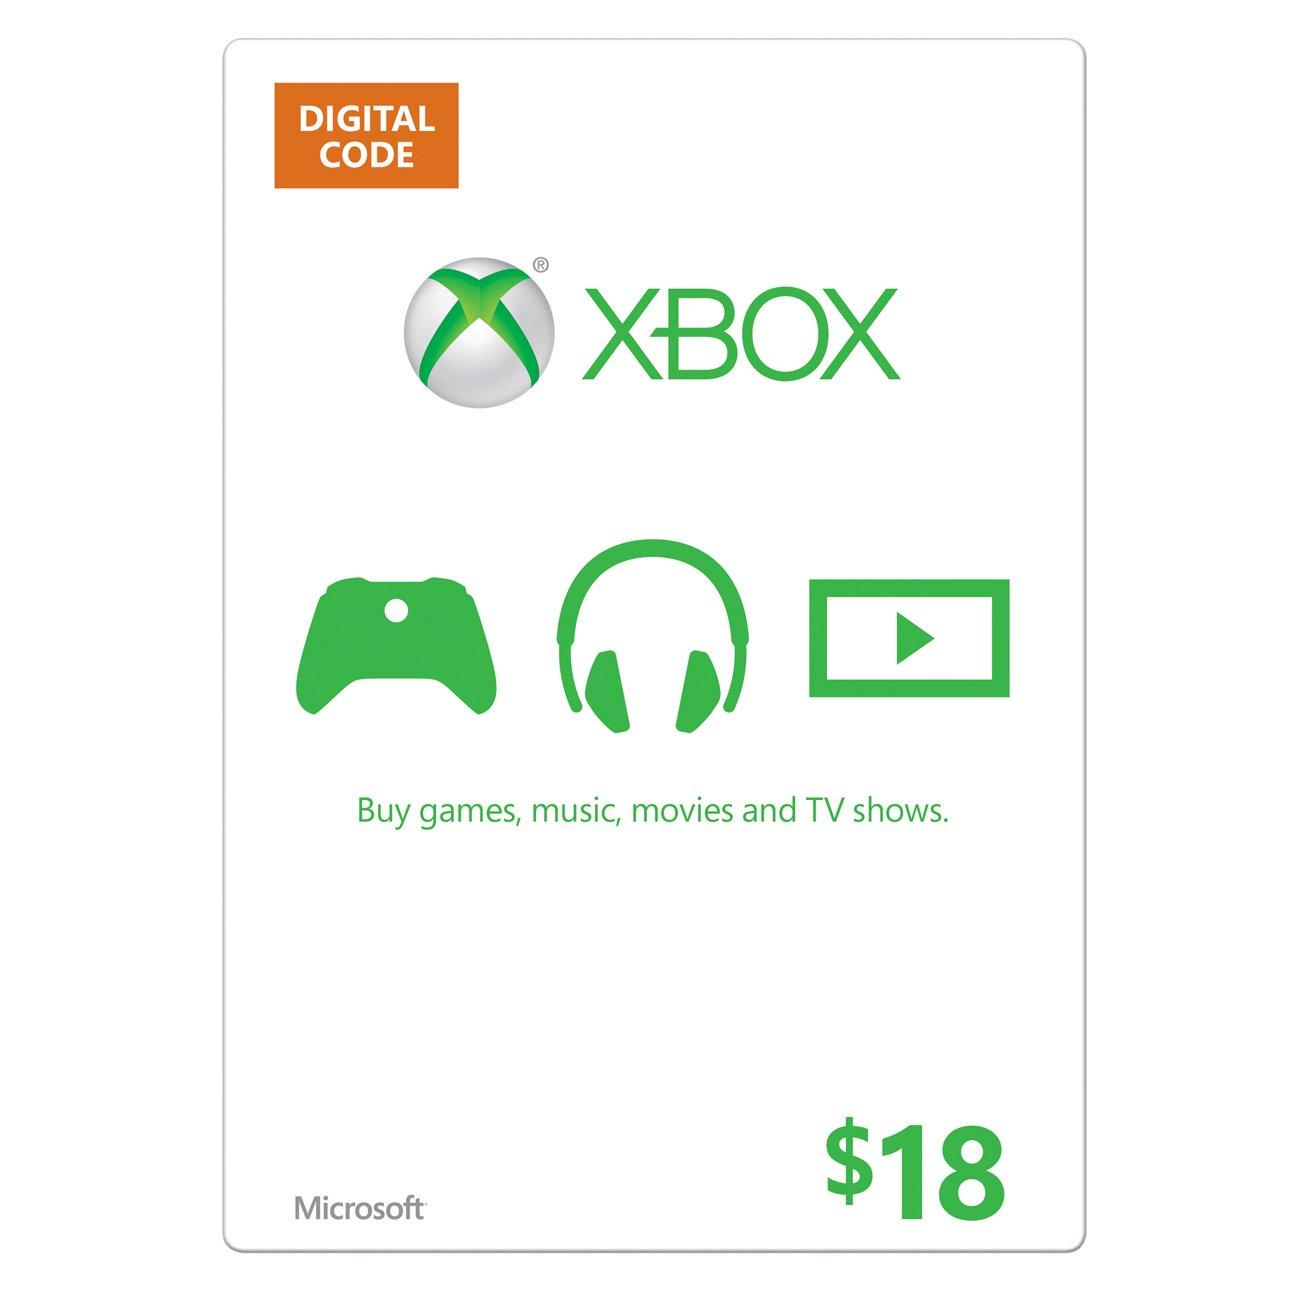 Amazon.com: Xbox Live $18 Gift Card - Xbox 360 Digital Code ...